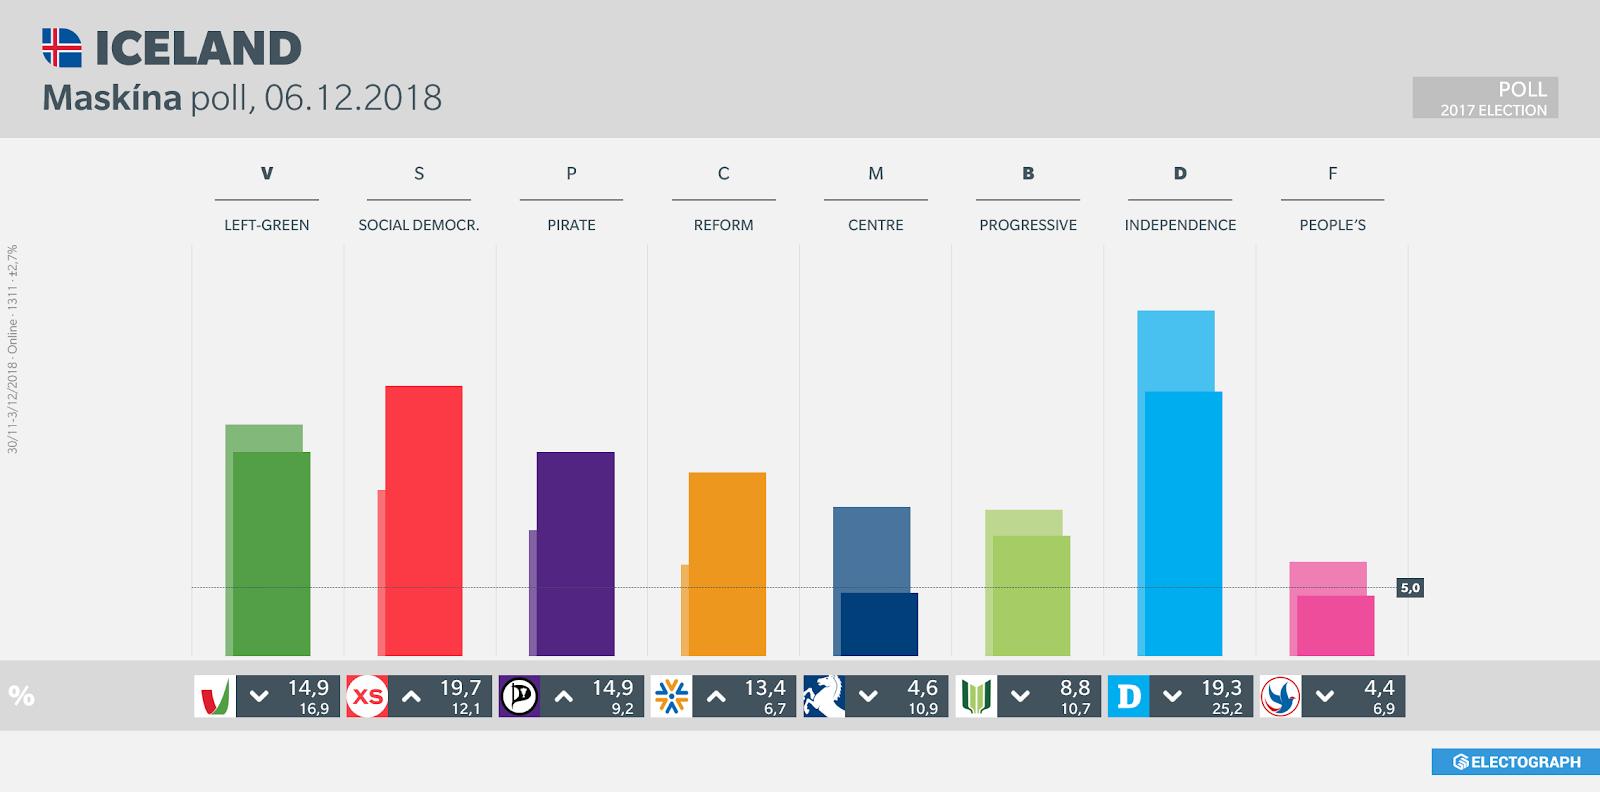 ICELAND: Maskína poll chart, 6 December 2018